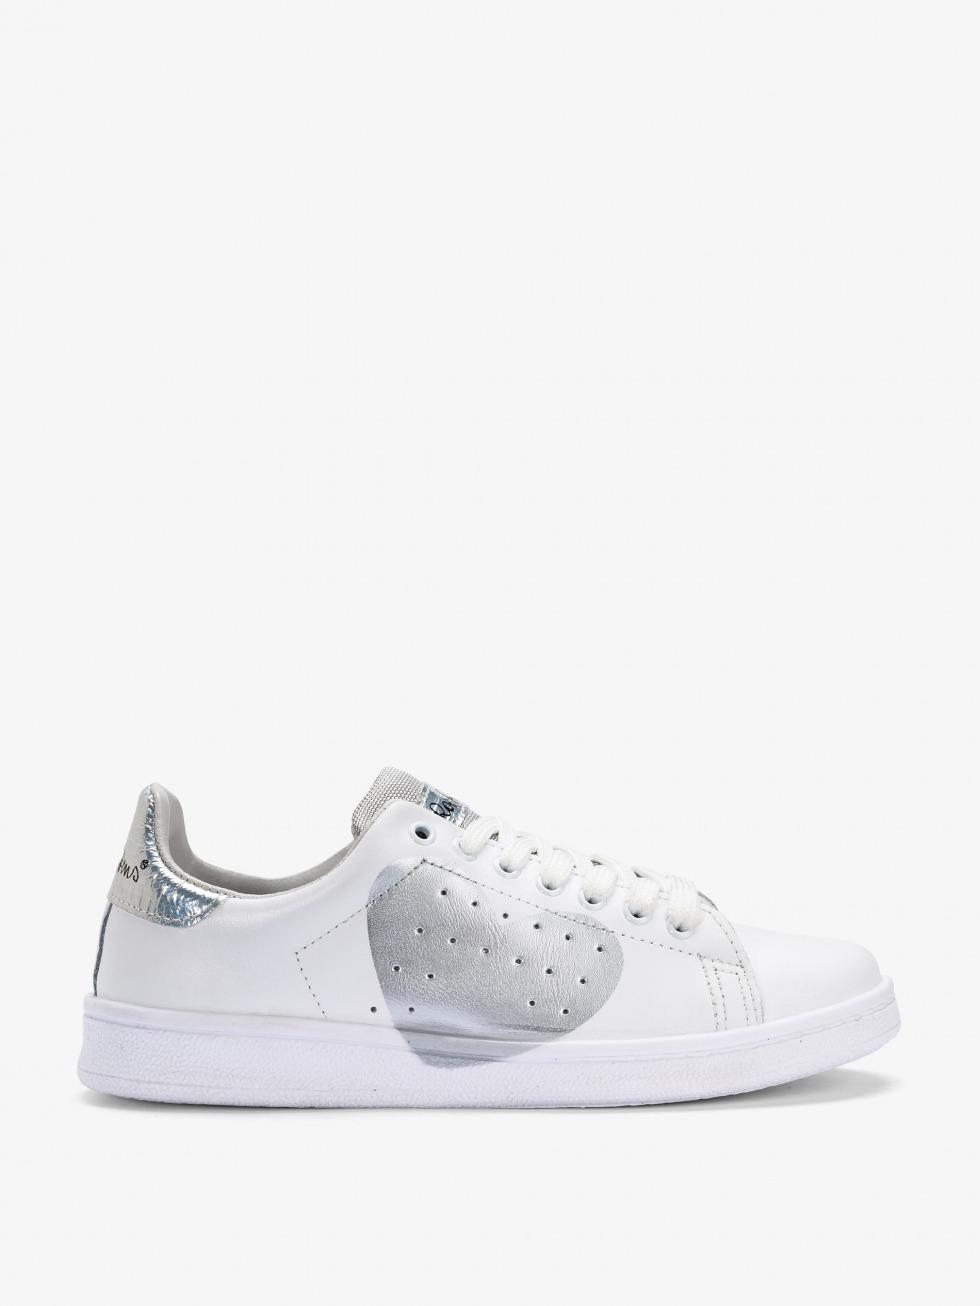 Sneakers Daiquiri - Cuore Space Silver